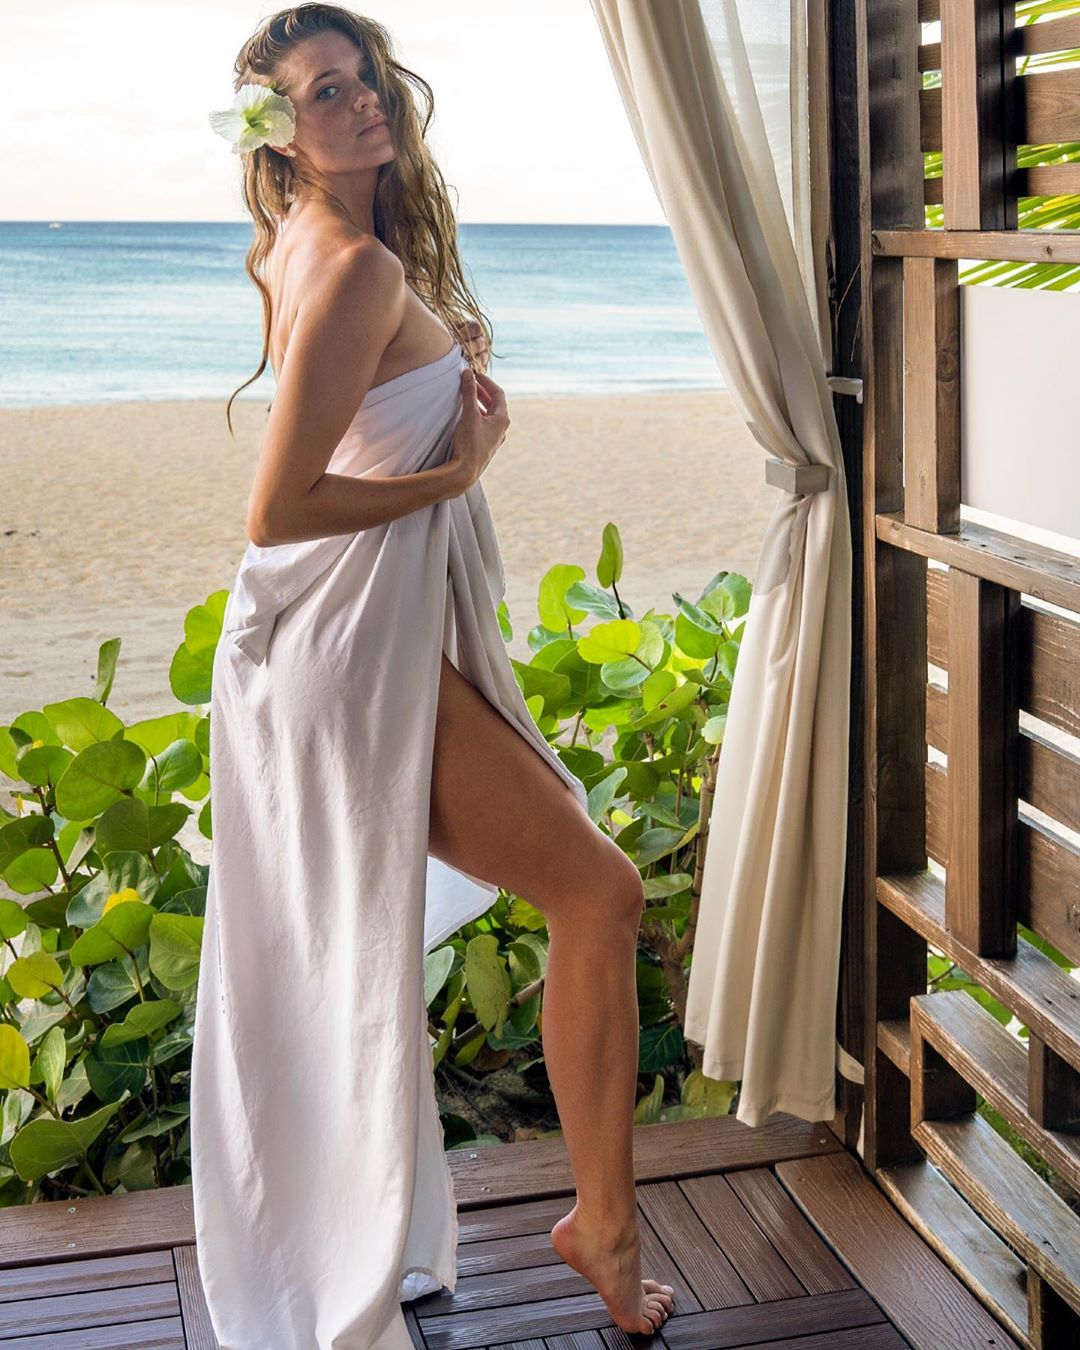 Alysha Newman Coming in Hot From Aruba! - Photo 2